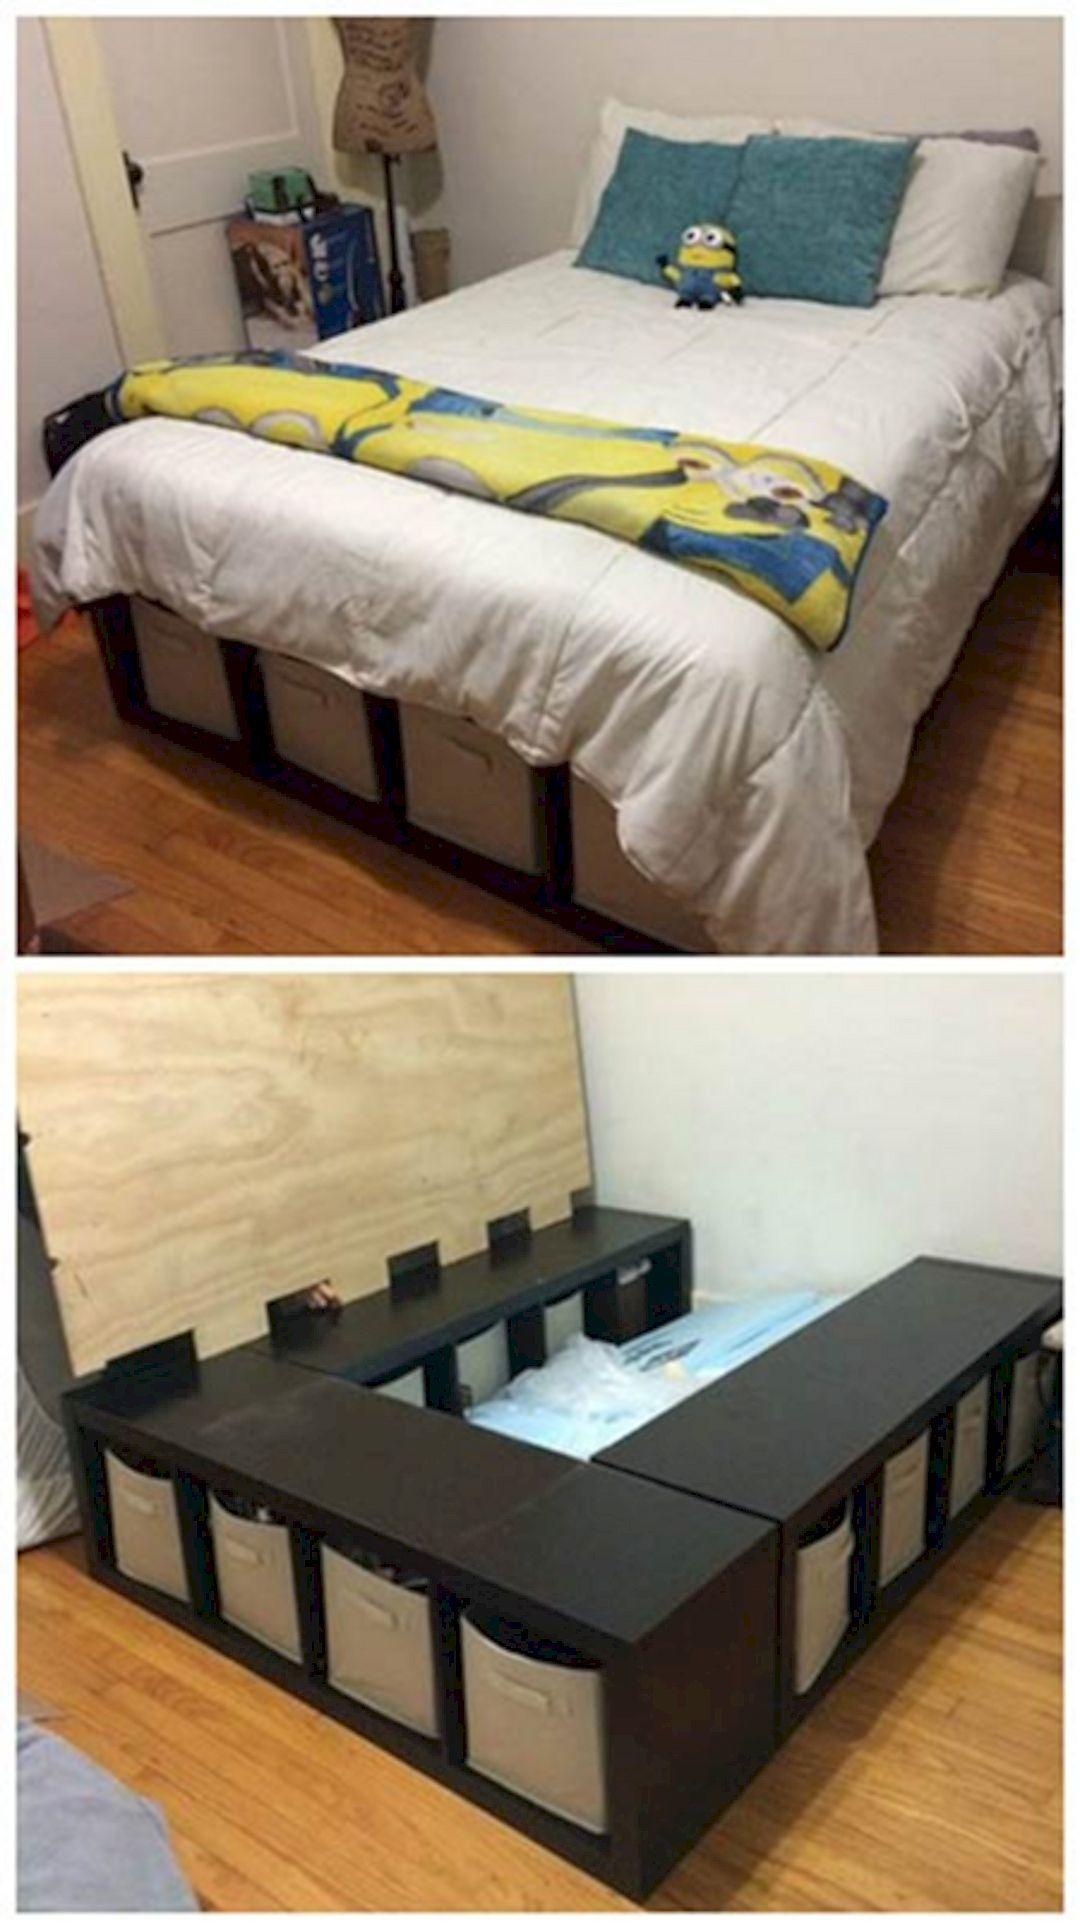 5 Stunning Bedroom Storage Ideas Diy Bedroom Storage Remodel Bedroom Bedroom Diy